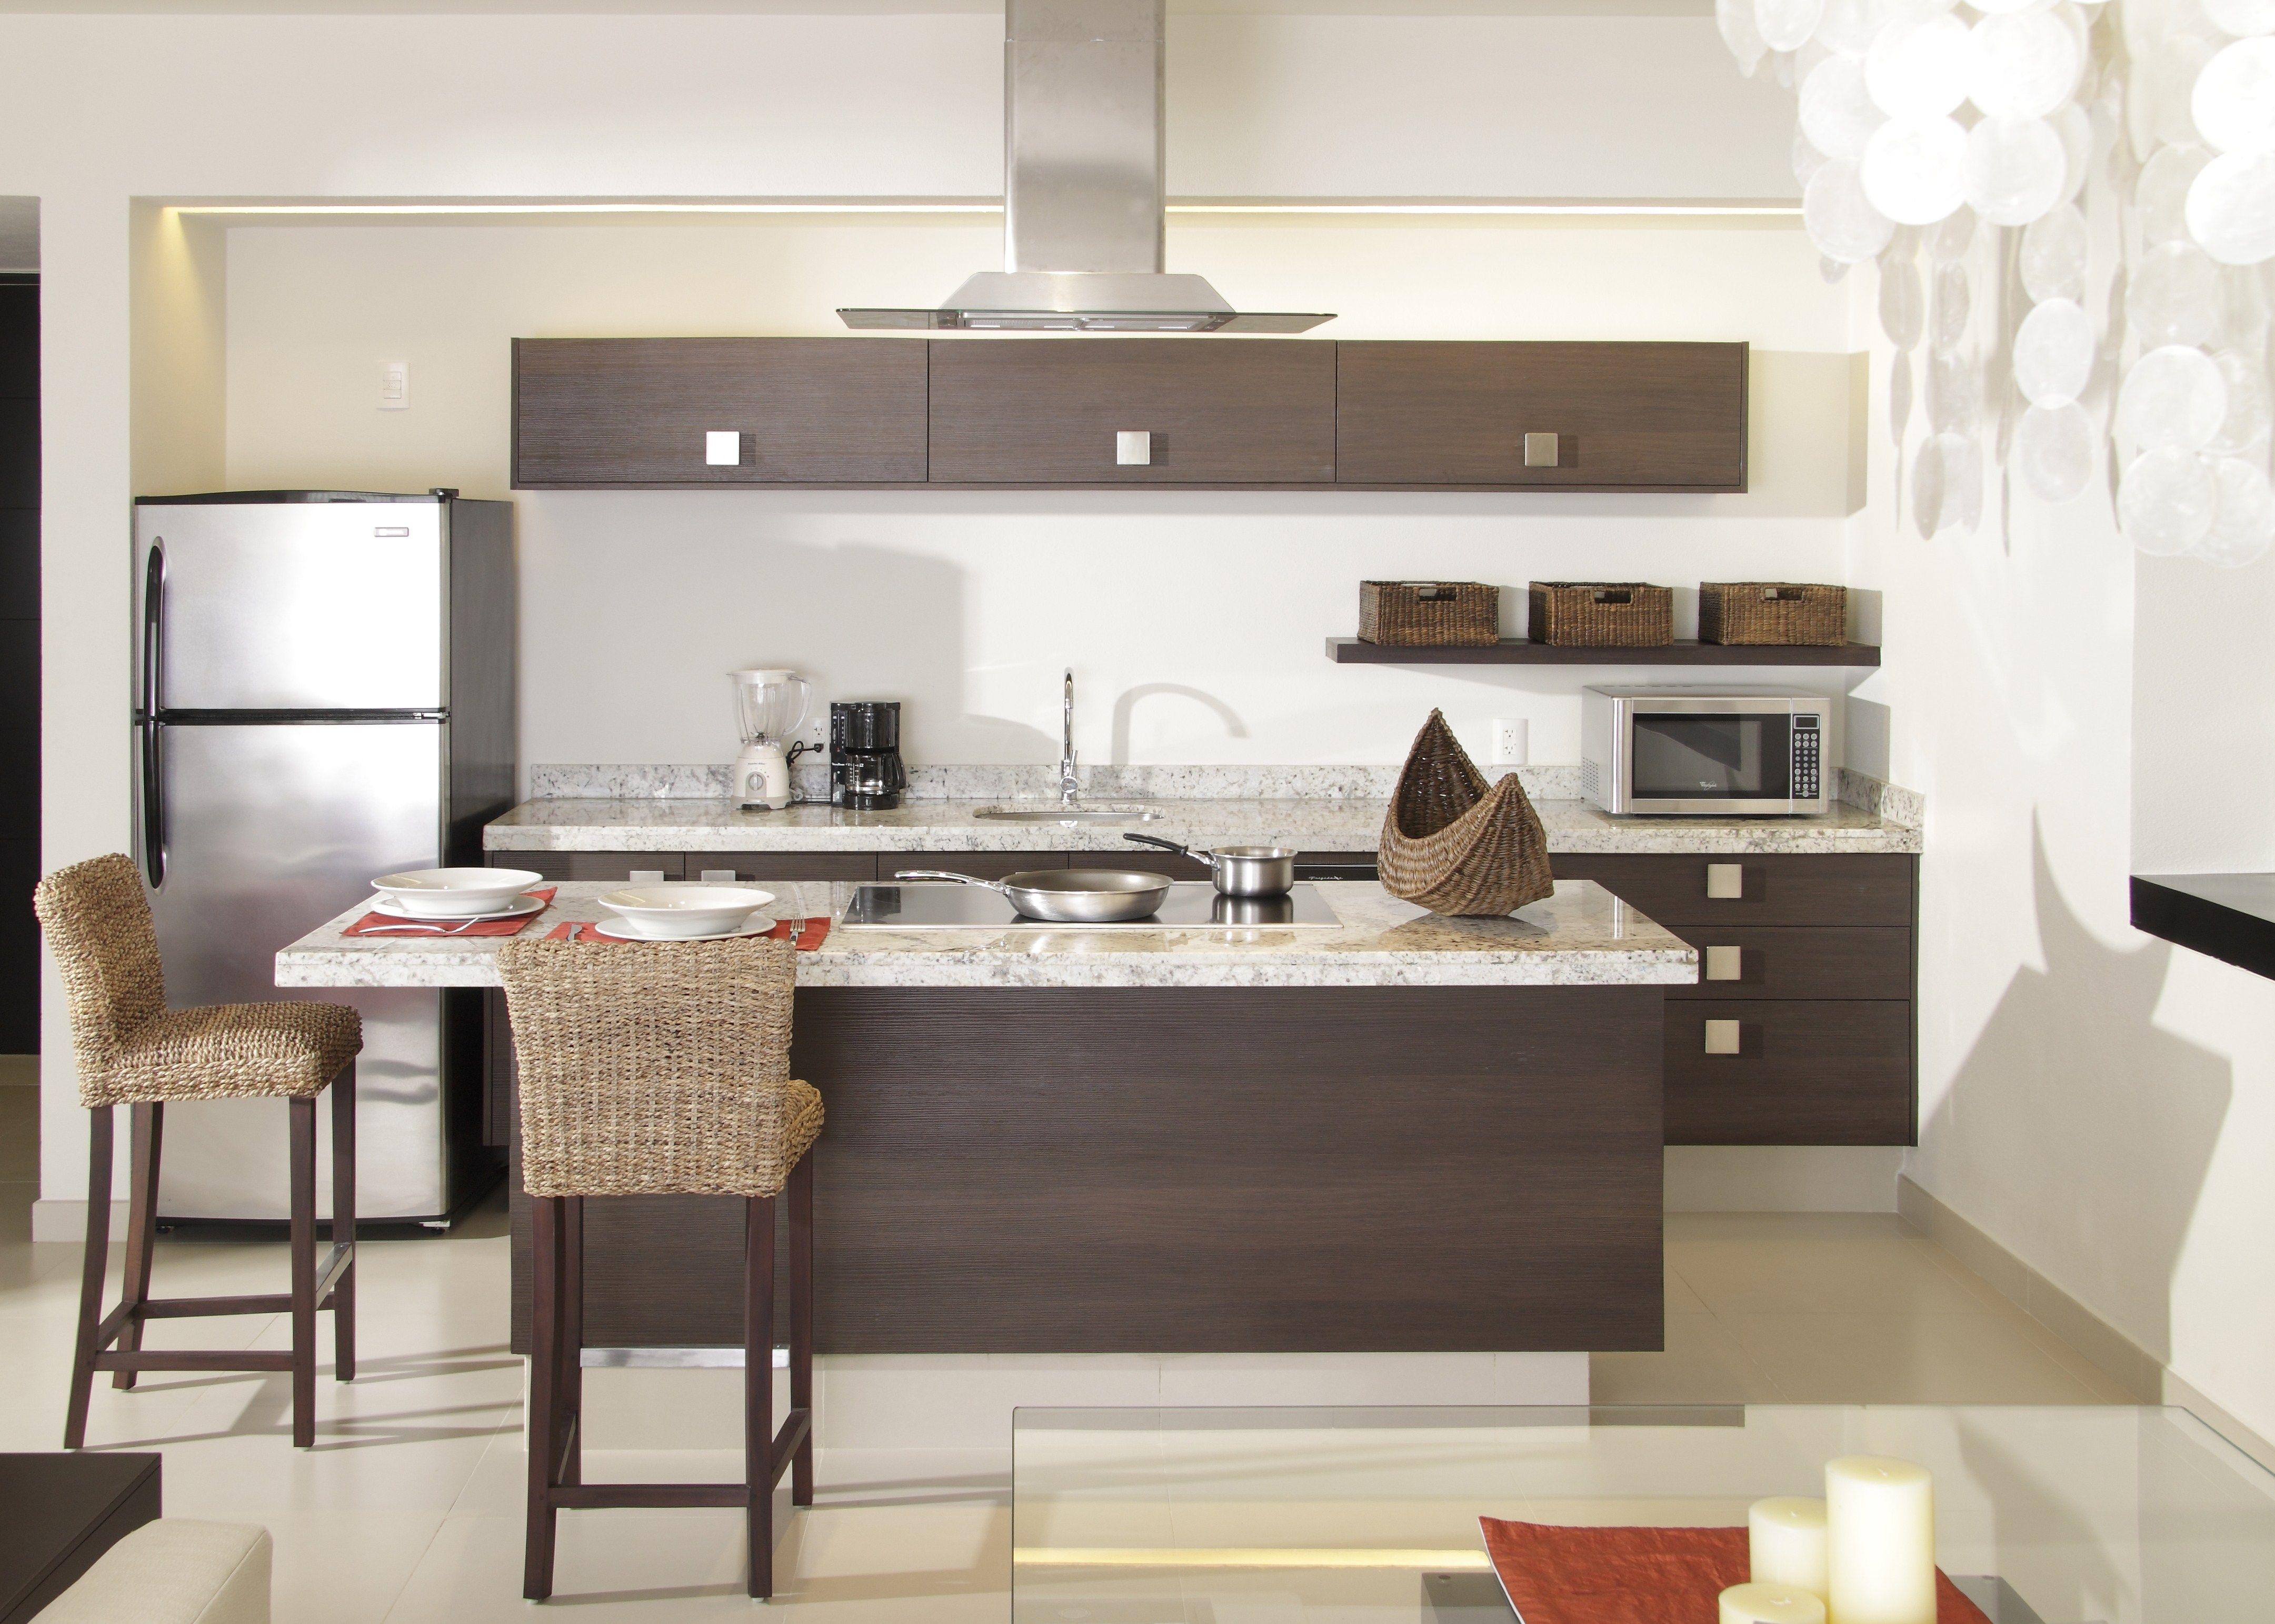 Como dise ar una casa peque a moderna buscar con google for Como disenar una isla para cocina